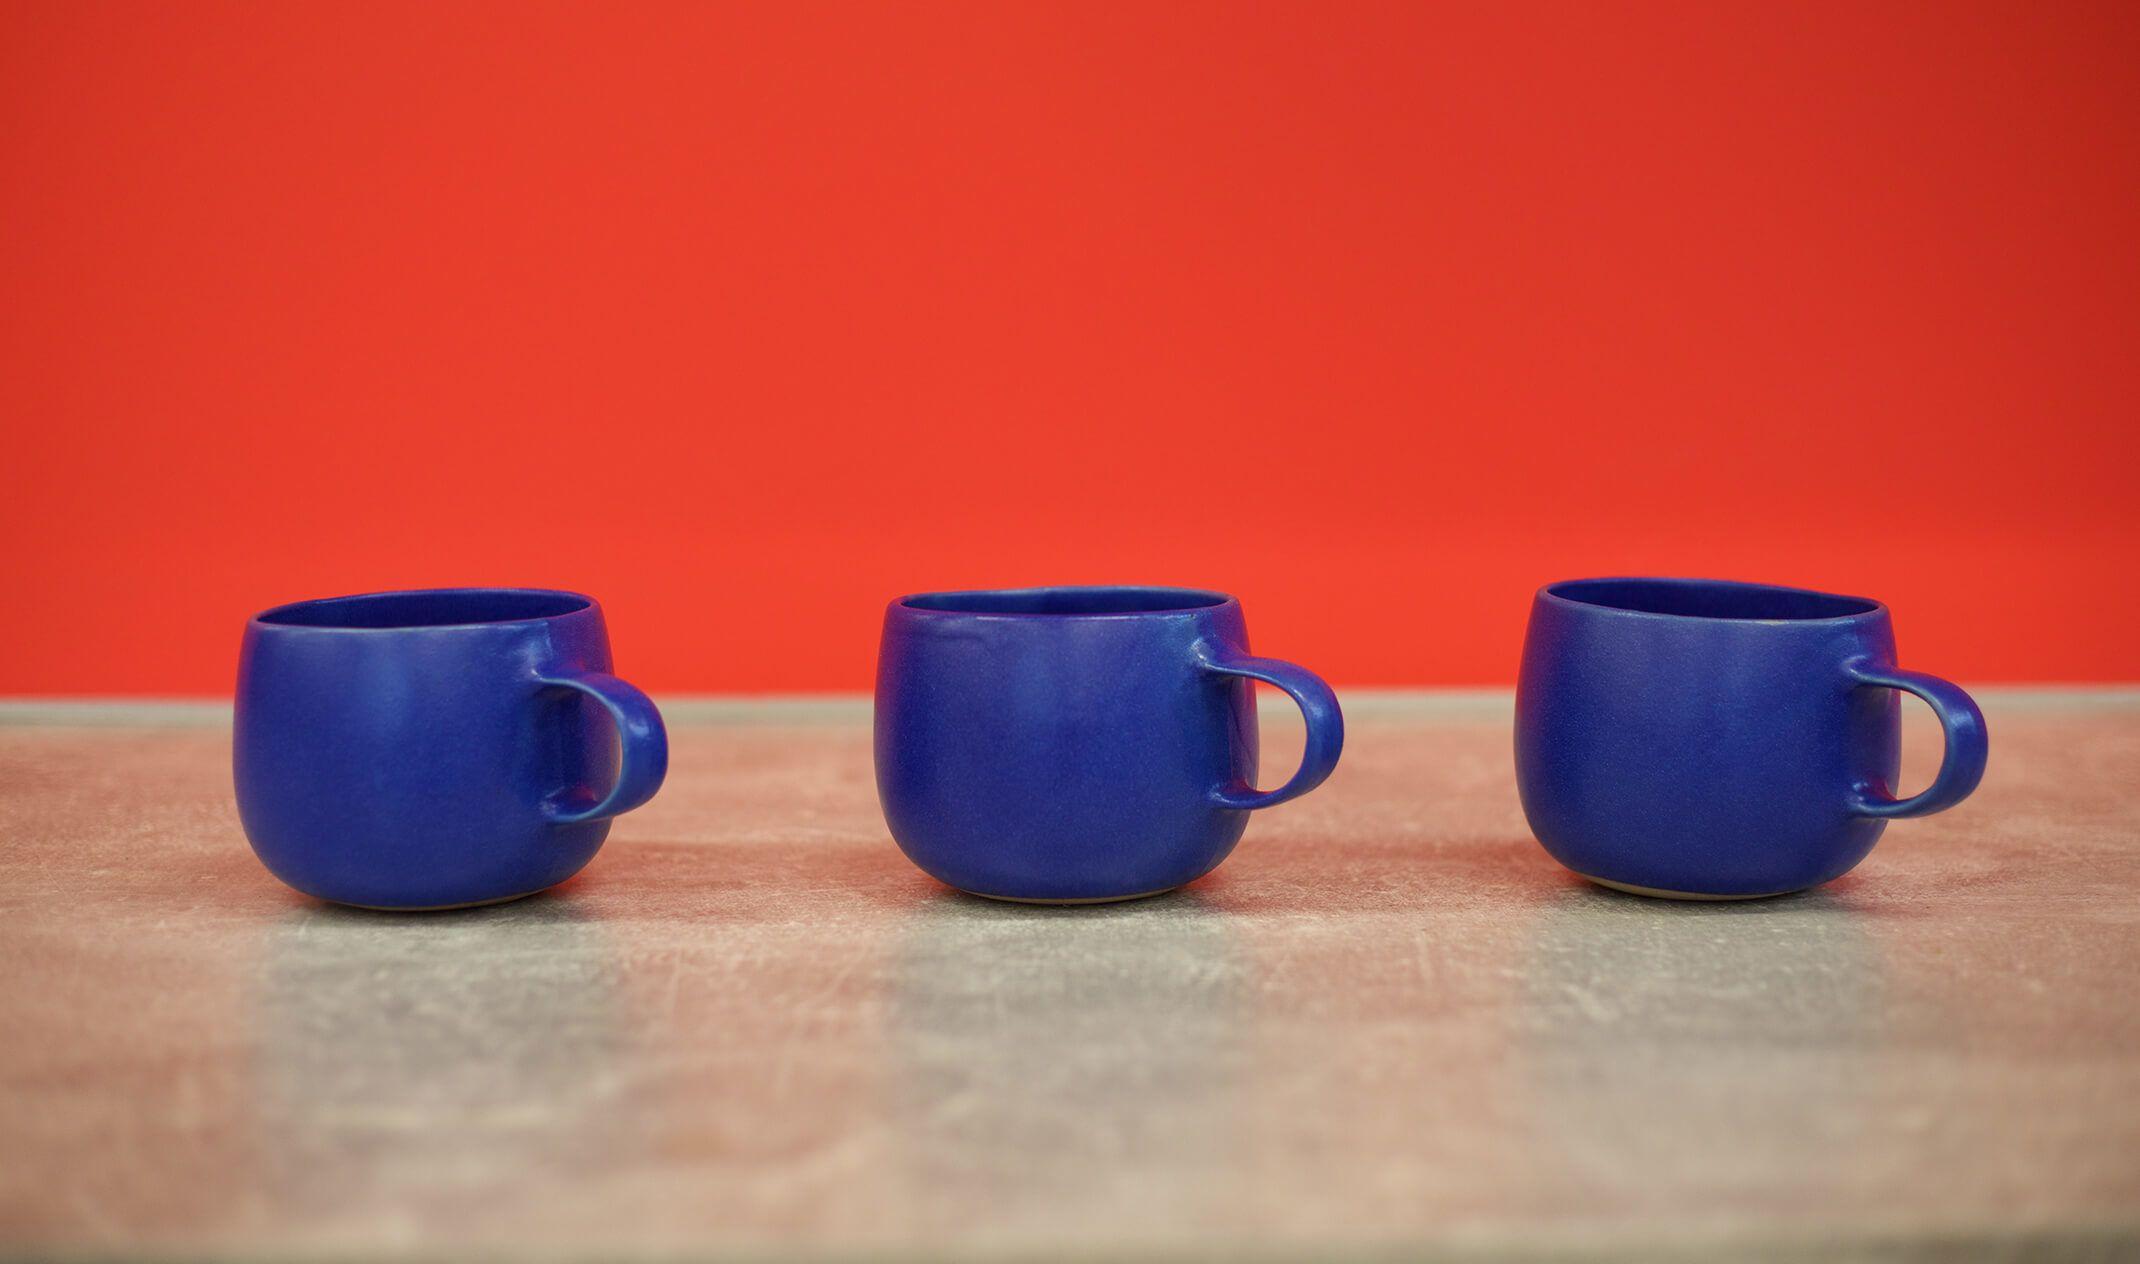 three blue mugs against red wall